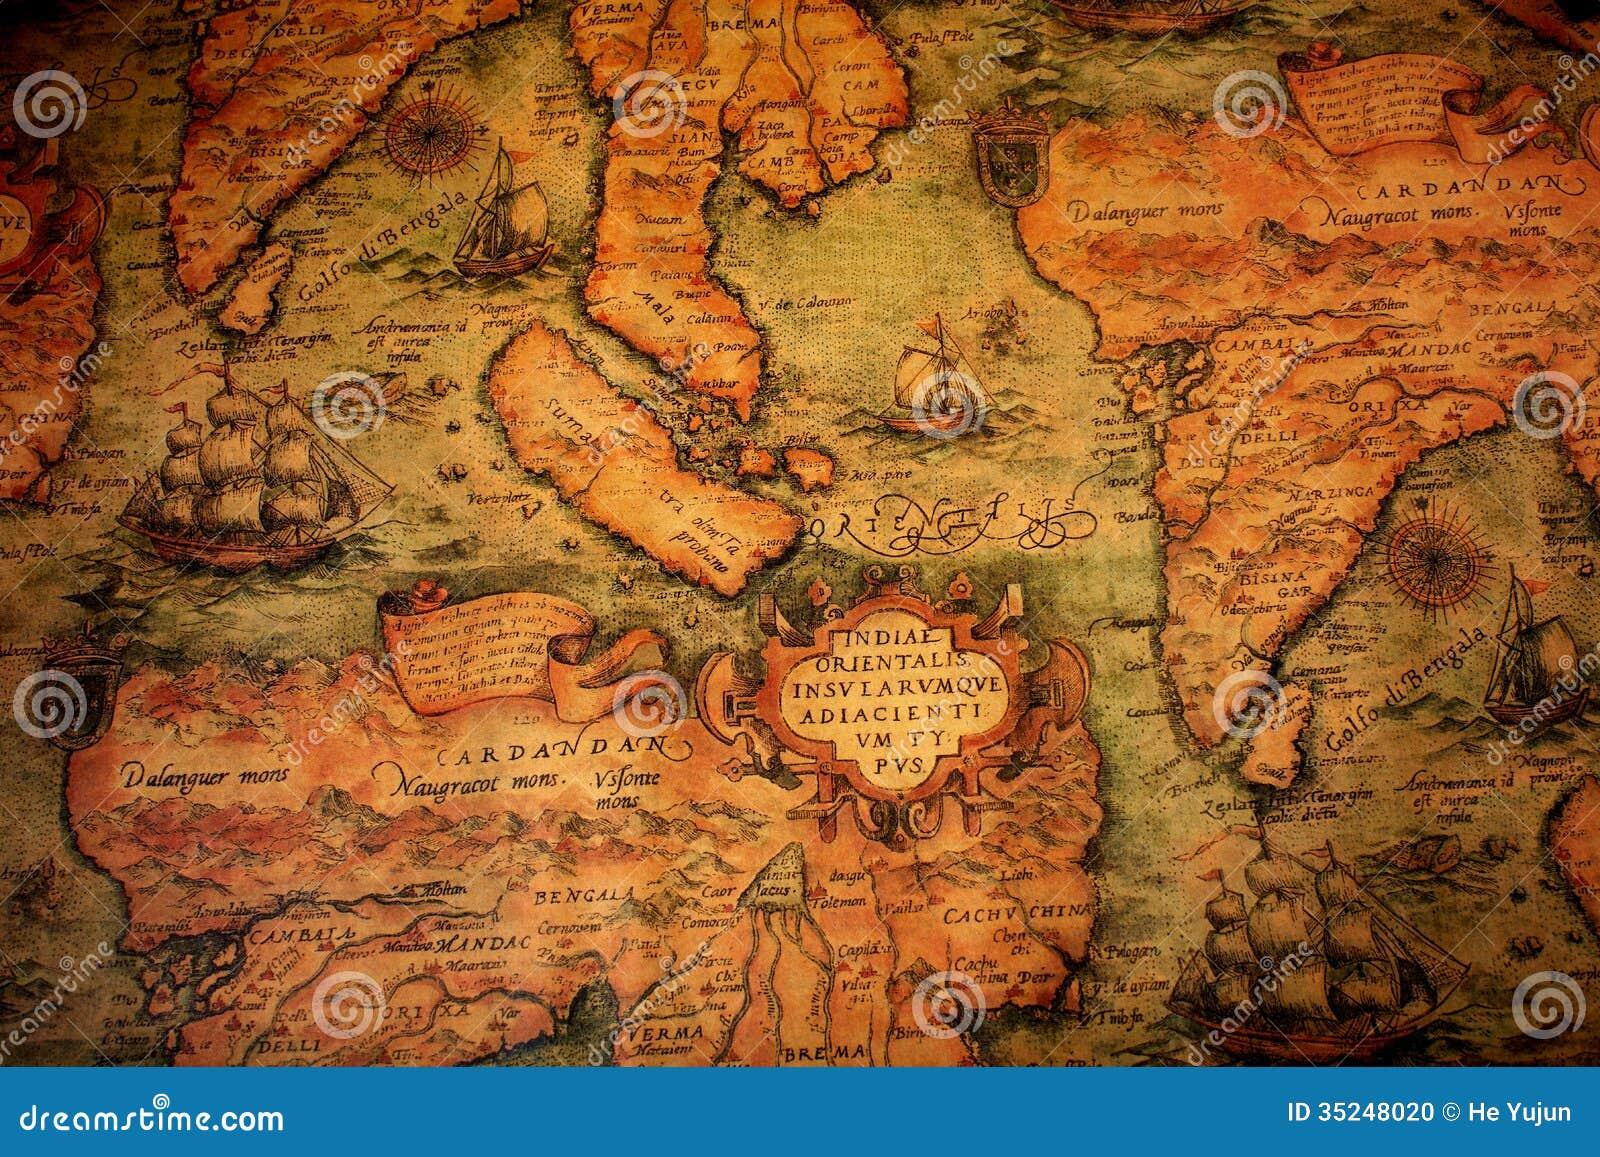 ancient global map royalty - photo #4